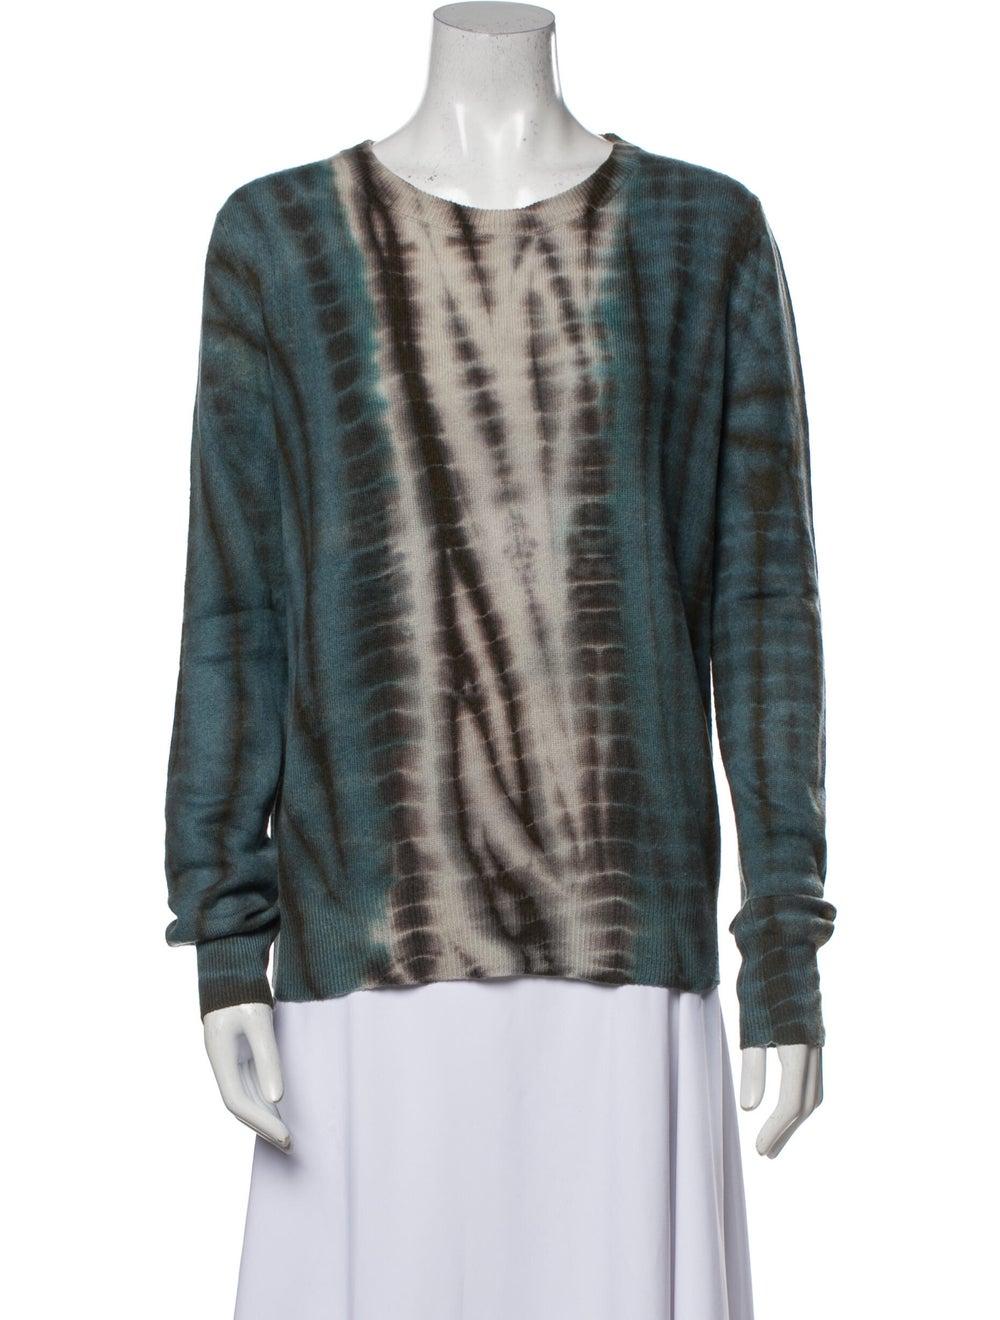 Libertine Cashmere Tie-Dye Print Sweater Blue - image 1